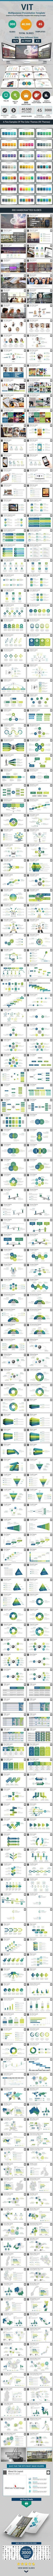 VIT Multipurpose PowerPoint Presentation Template (PowerPoint Templates)